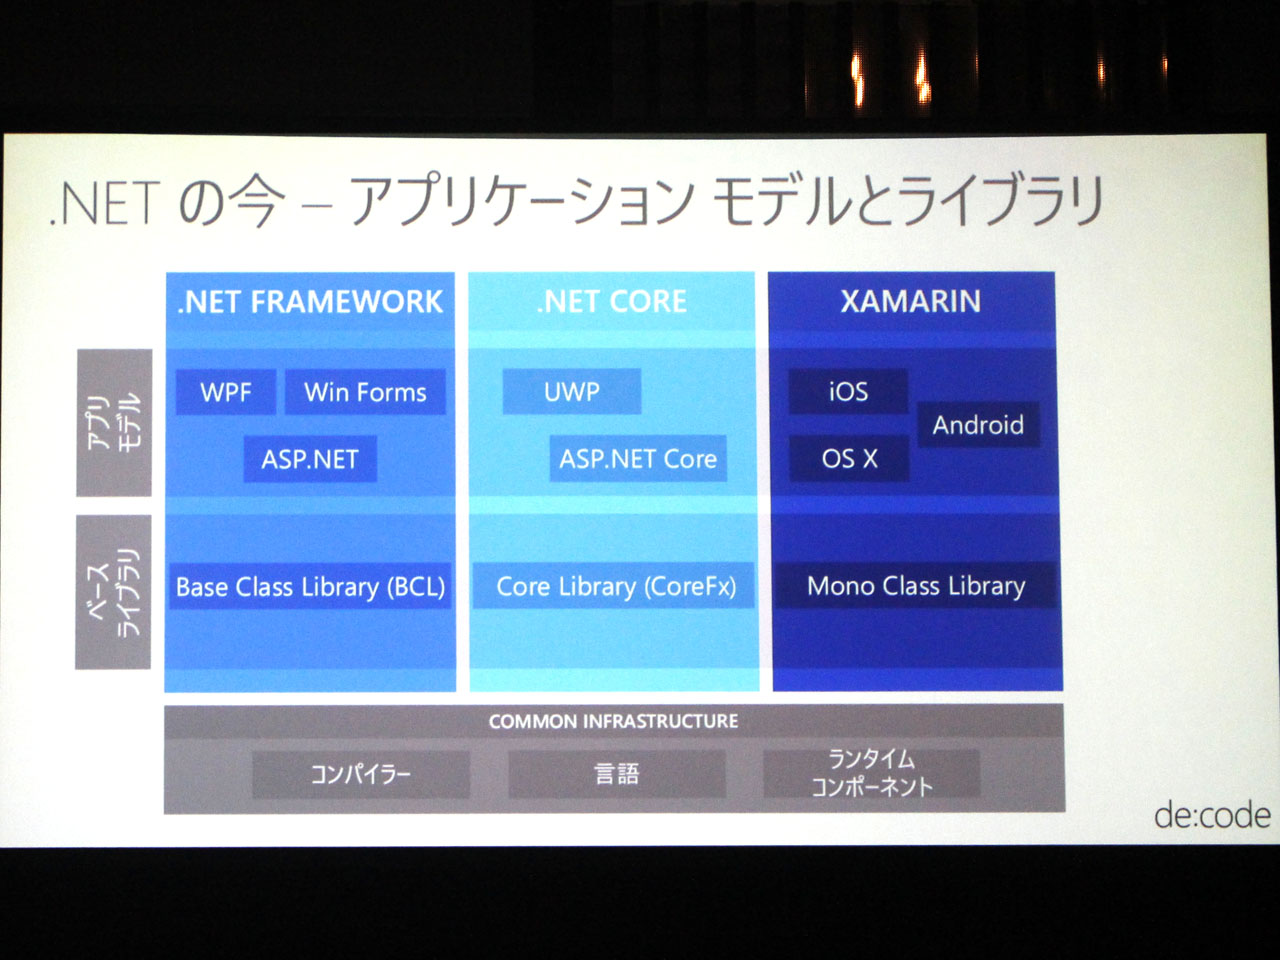 Microsoftは現在、.NET Framework、先日オープンソース化された.NET Core、そしてXamarinがある